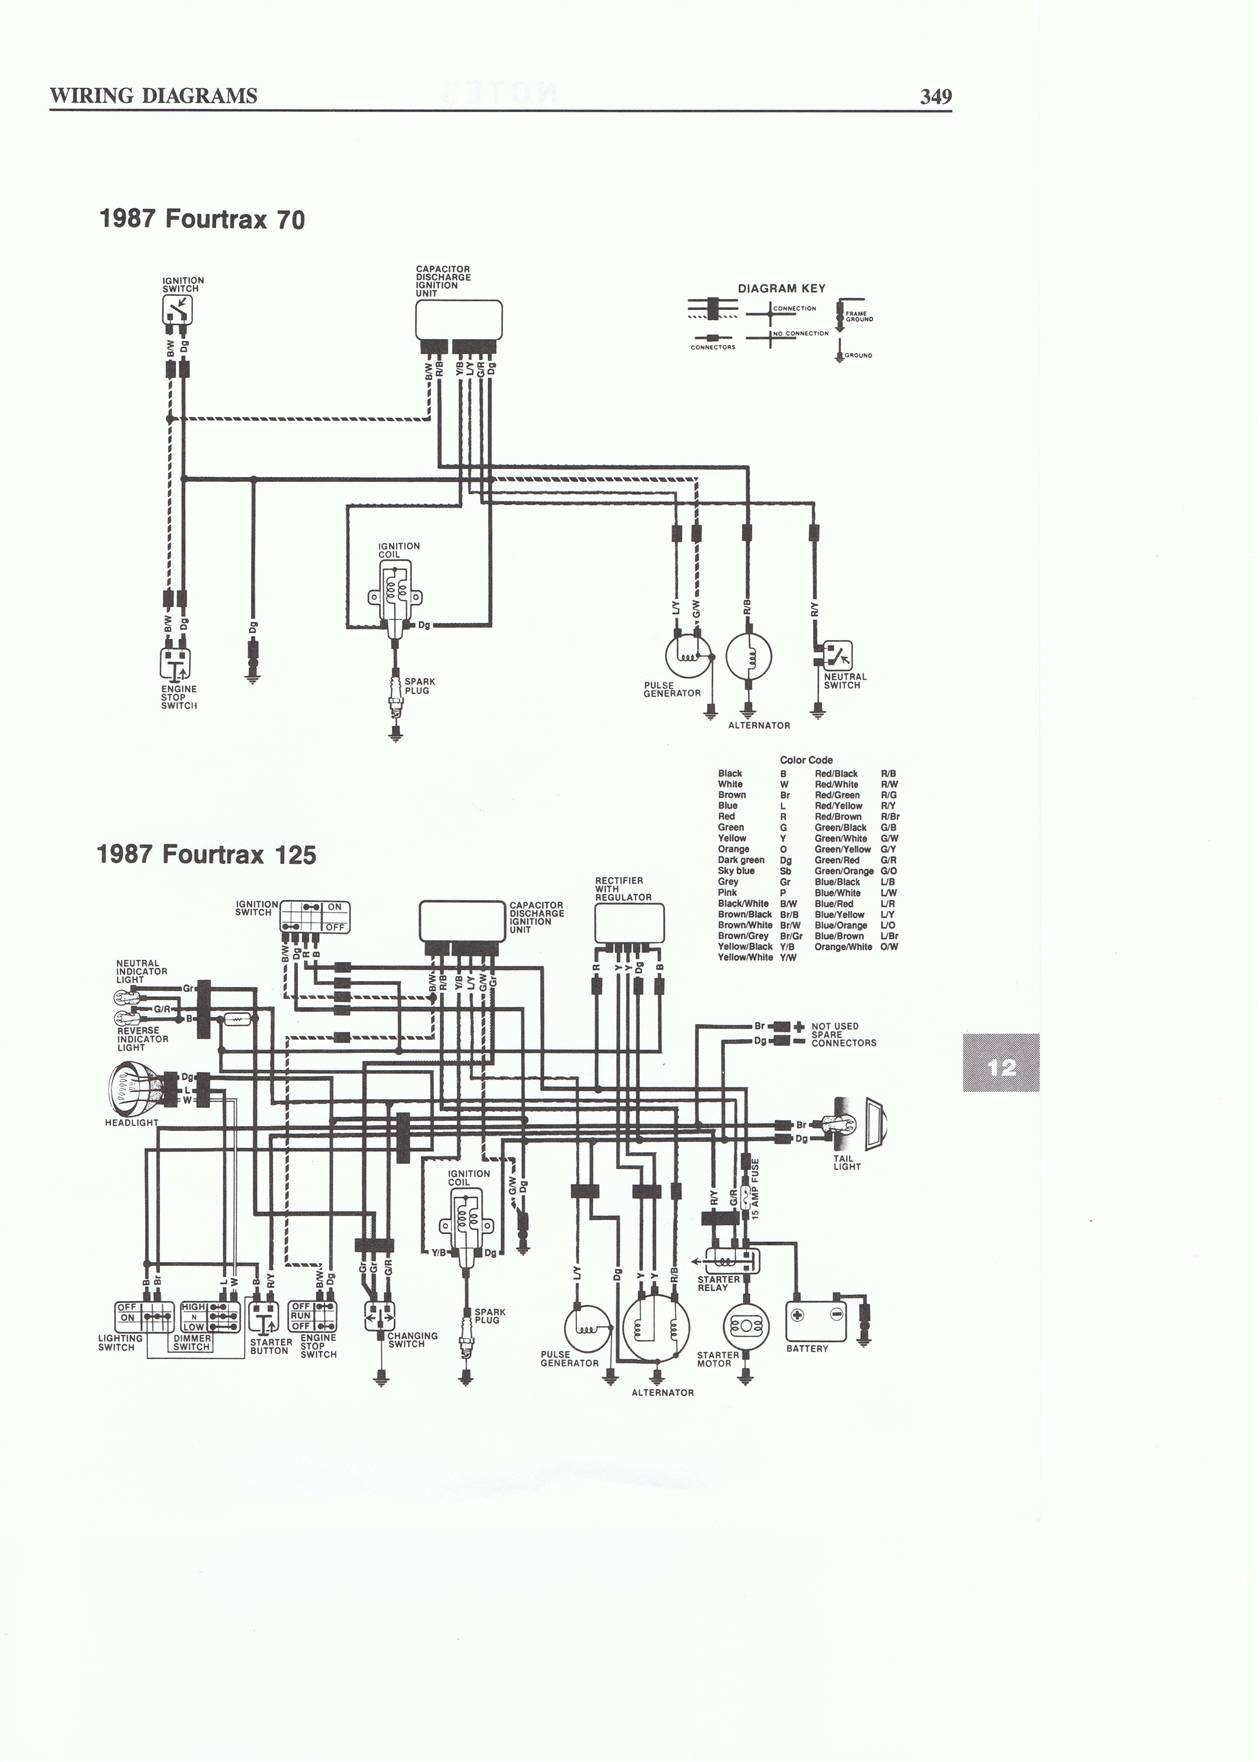 kazuma raptor 50cc atv wiring diagram product wiring diagrams u2022 baja 50cc four wheeler wire diagram kazuma raptor 50cc atv wiring diagram [ 1260 x 1762 Pixel ]